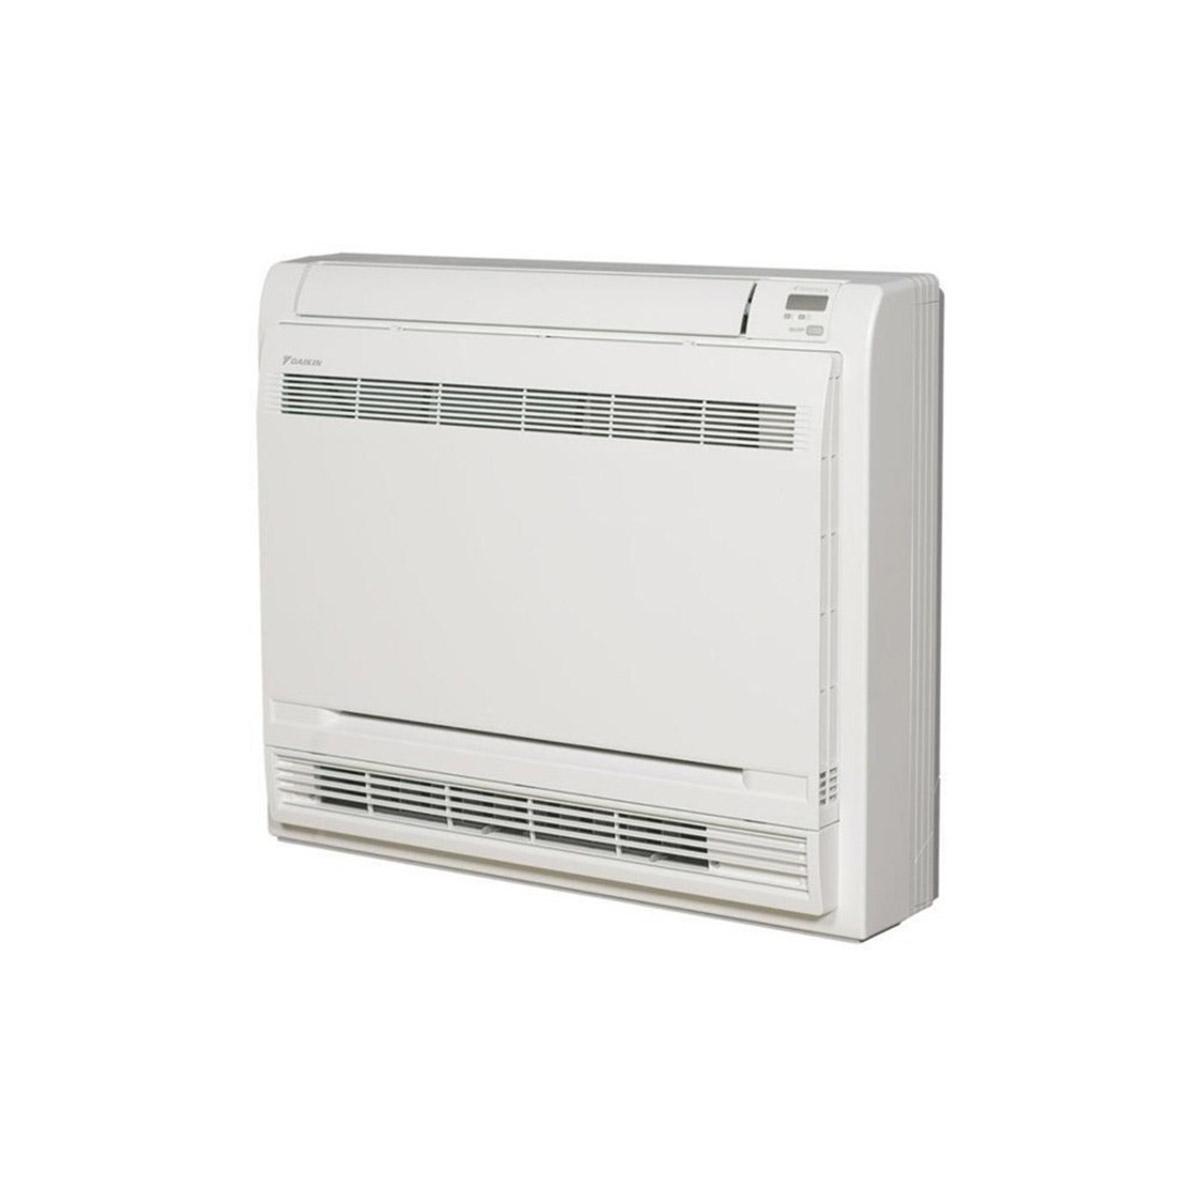 Aparat de aer conditionat tip podea Daikin Bluevolution FVXM50F-RXM50N9 Inverter 18000 BTU 13